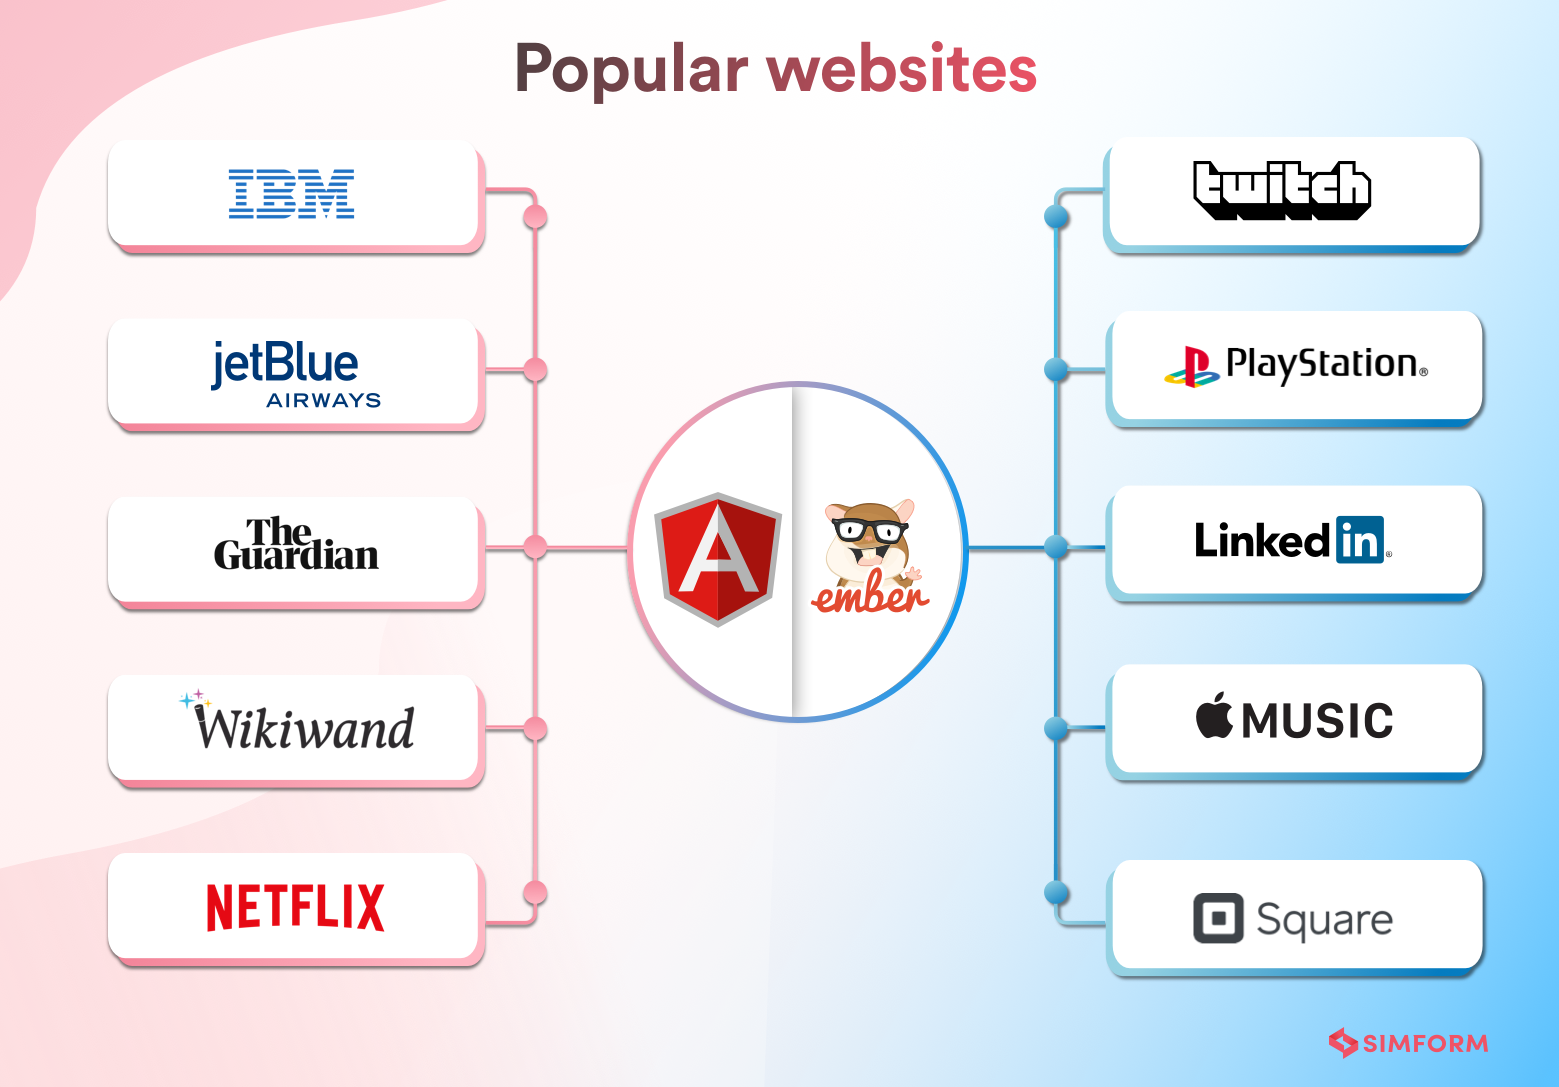 PopularWebsitesUsingAngularjsEmberjs